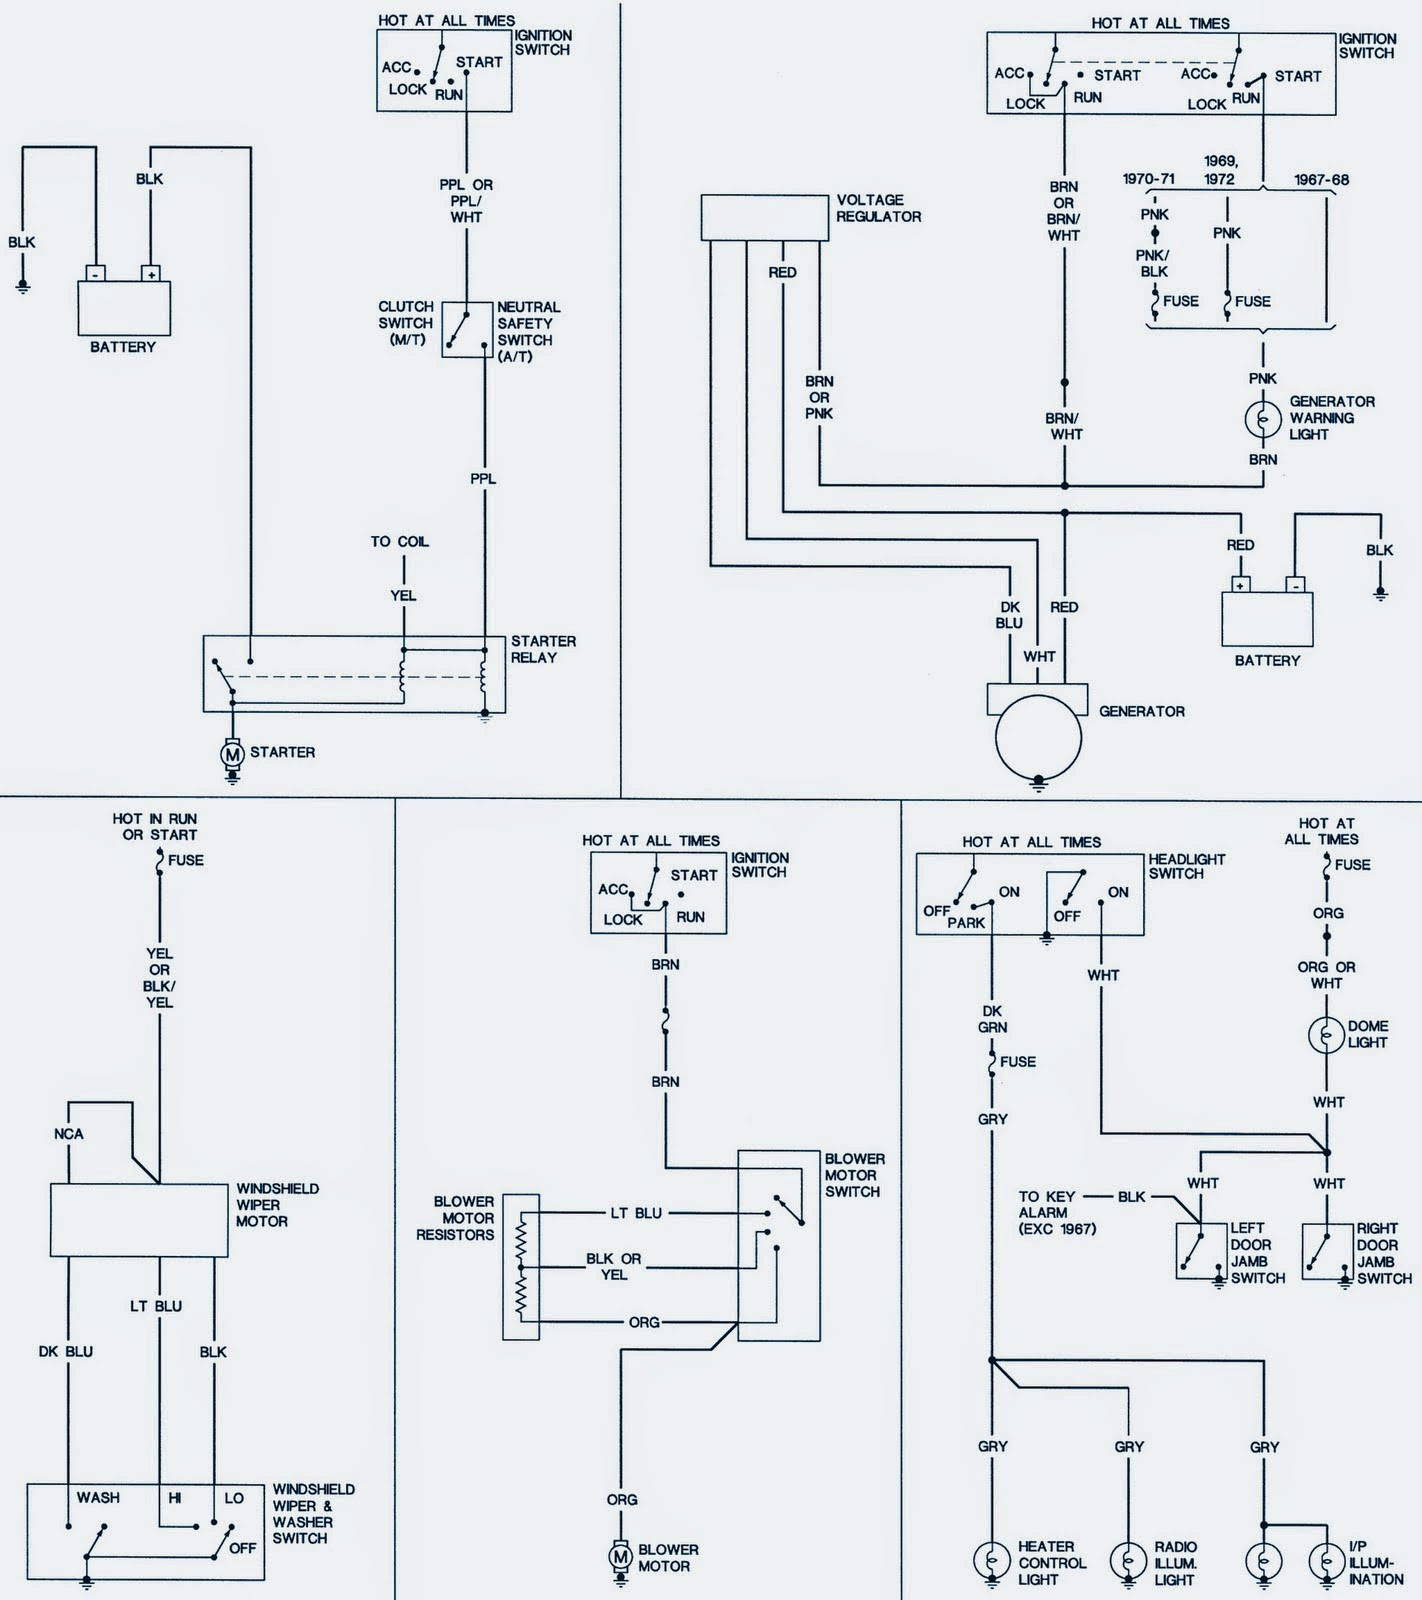 1968 Chevrolet camaro Wiring Diagram | Electrical Winding